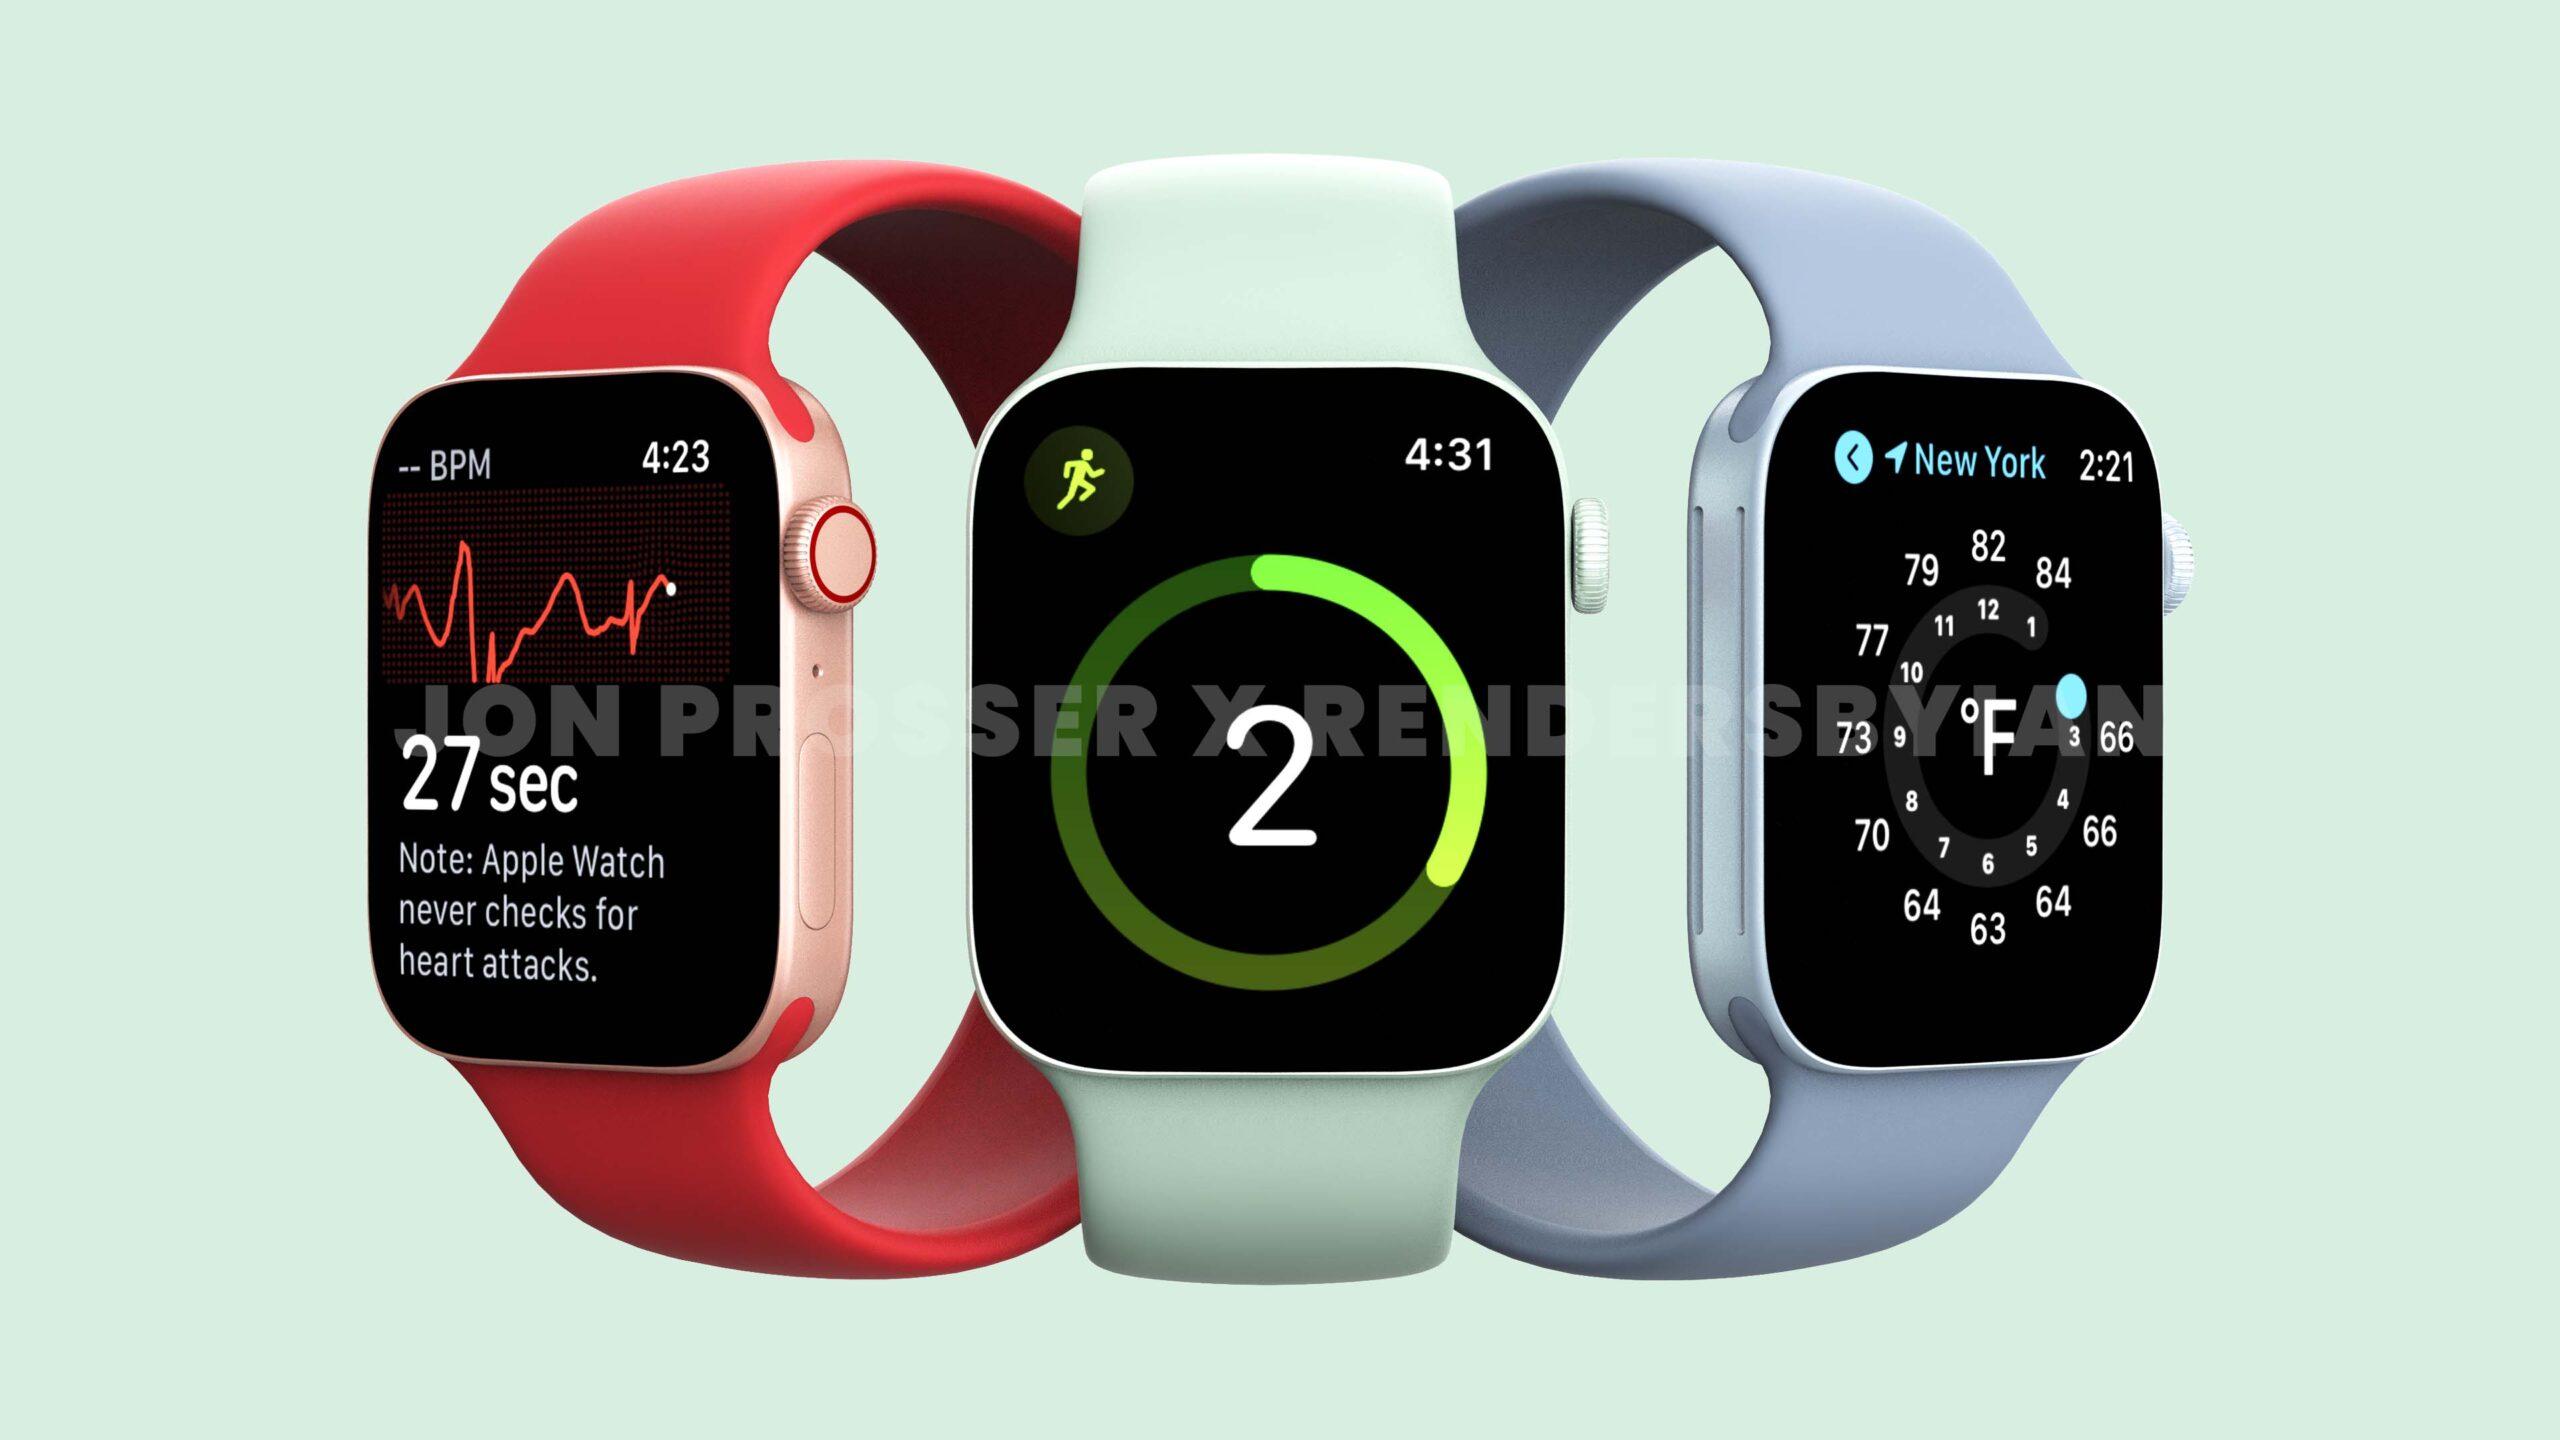 「Apple Watch Series 7」は画面と性能がアップデート、エクストリームスポーツモデルは2022年に登場